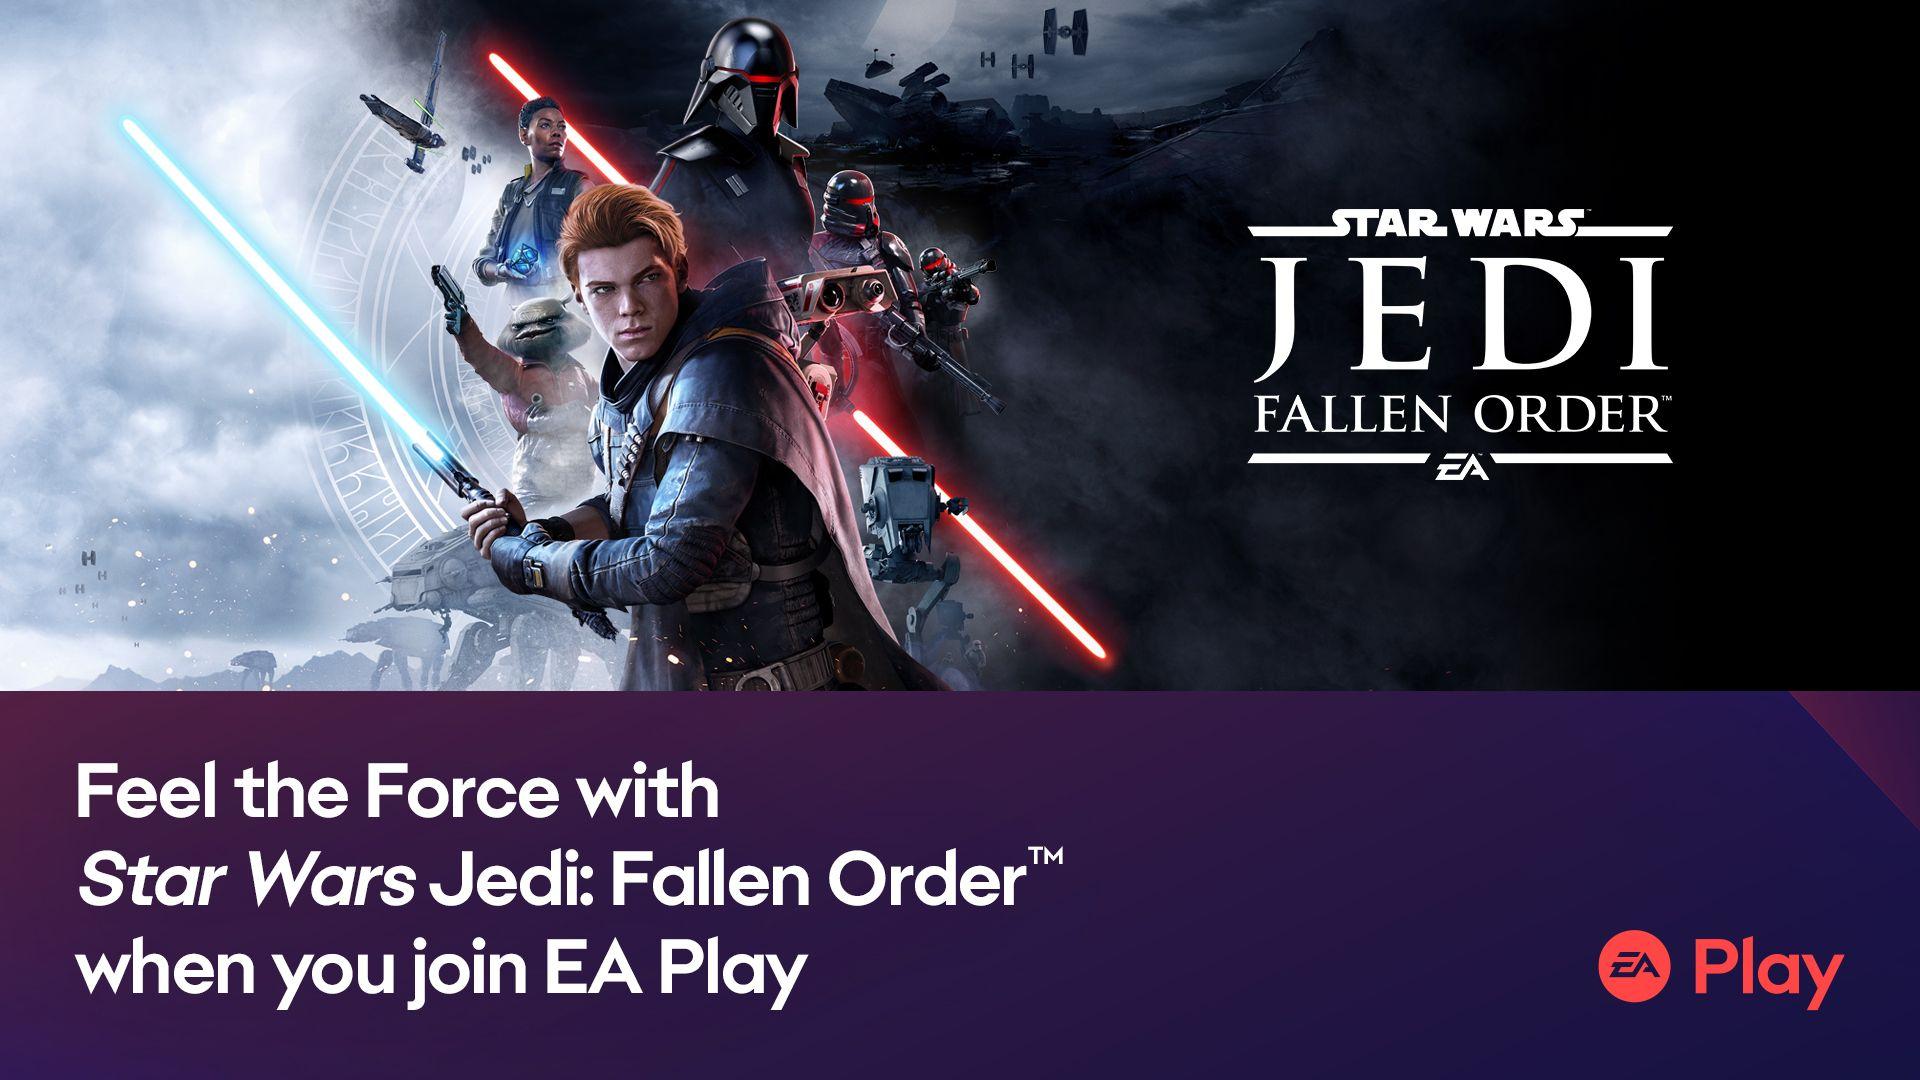 Star Wars Jedi: Fallen Order via Xbox Game Pass